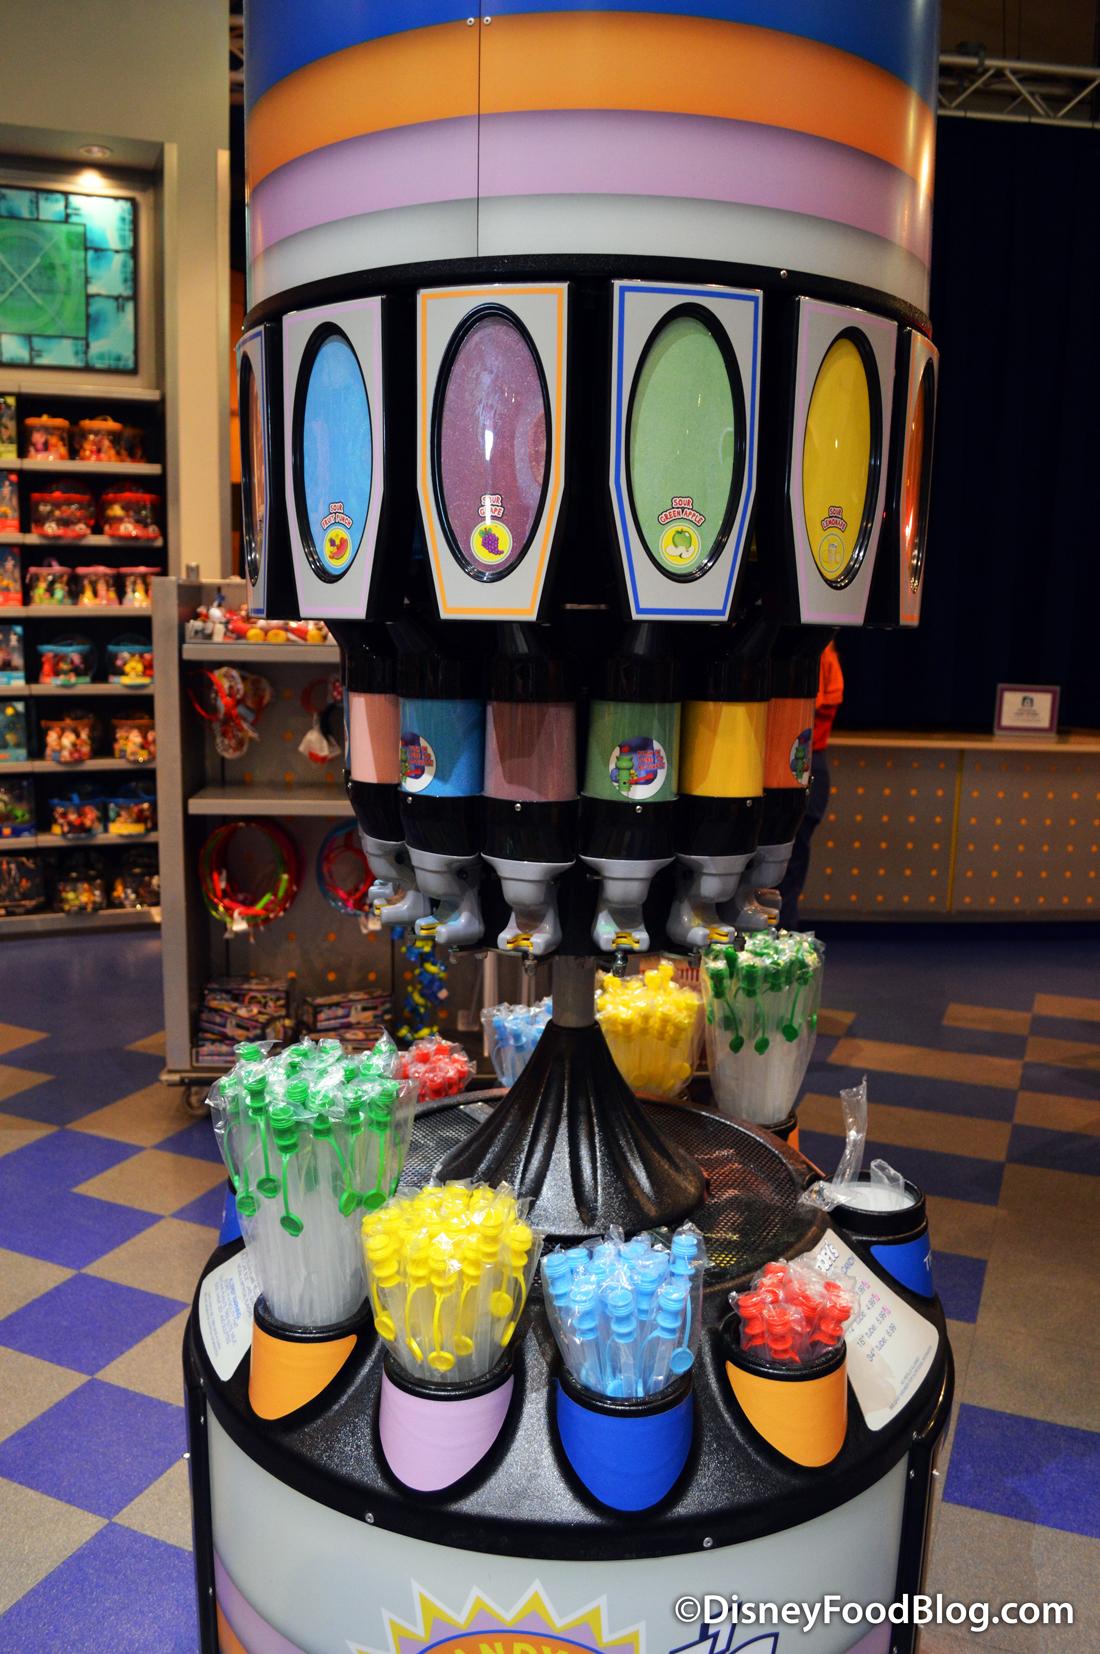 Candy S Colorado Cranker Blog Csm Tools For Cranking: The Disney Food Blog